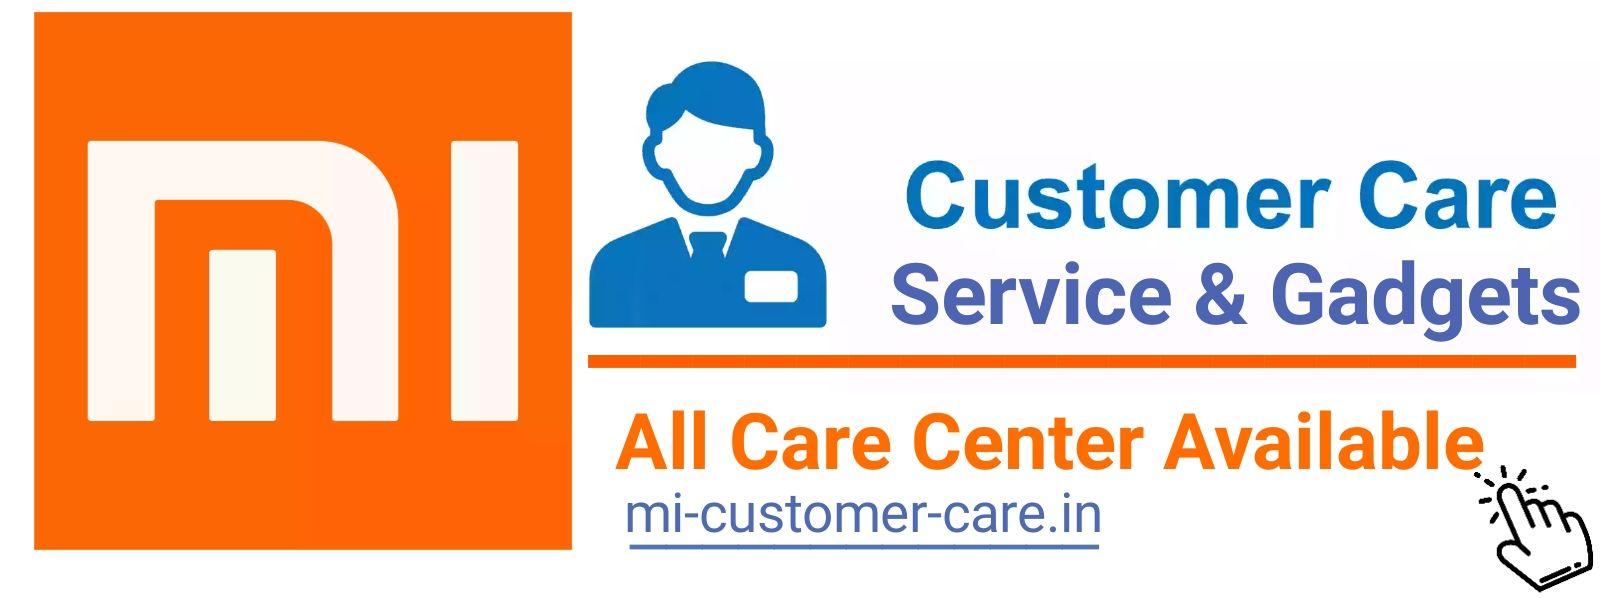 Mi Customer Care Service Customer care, Care, Customer